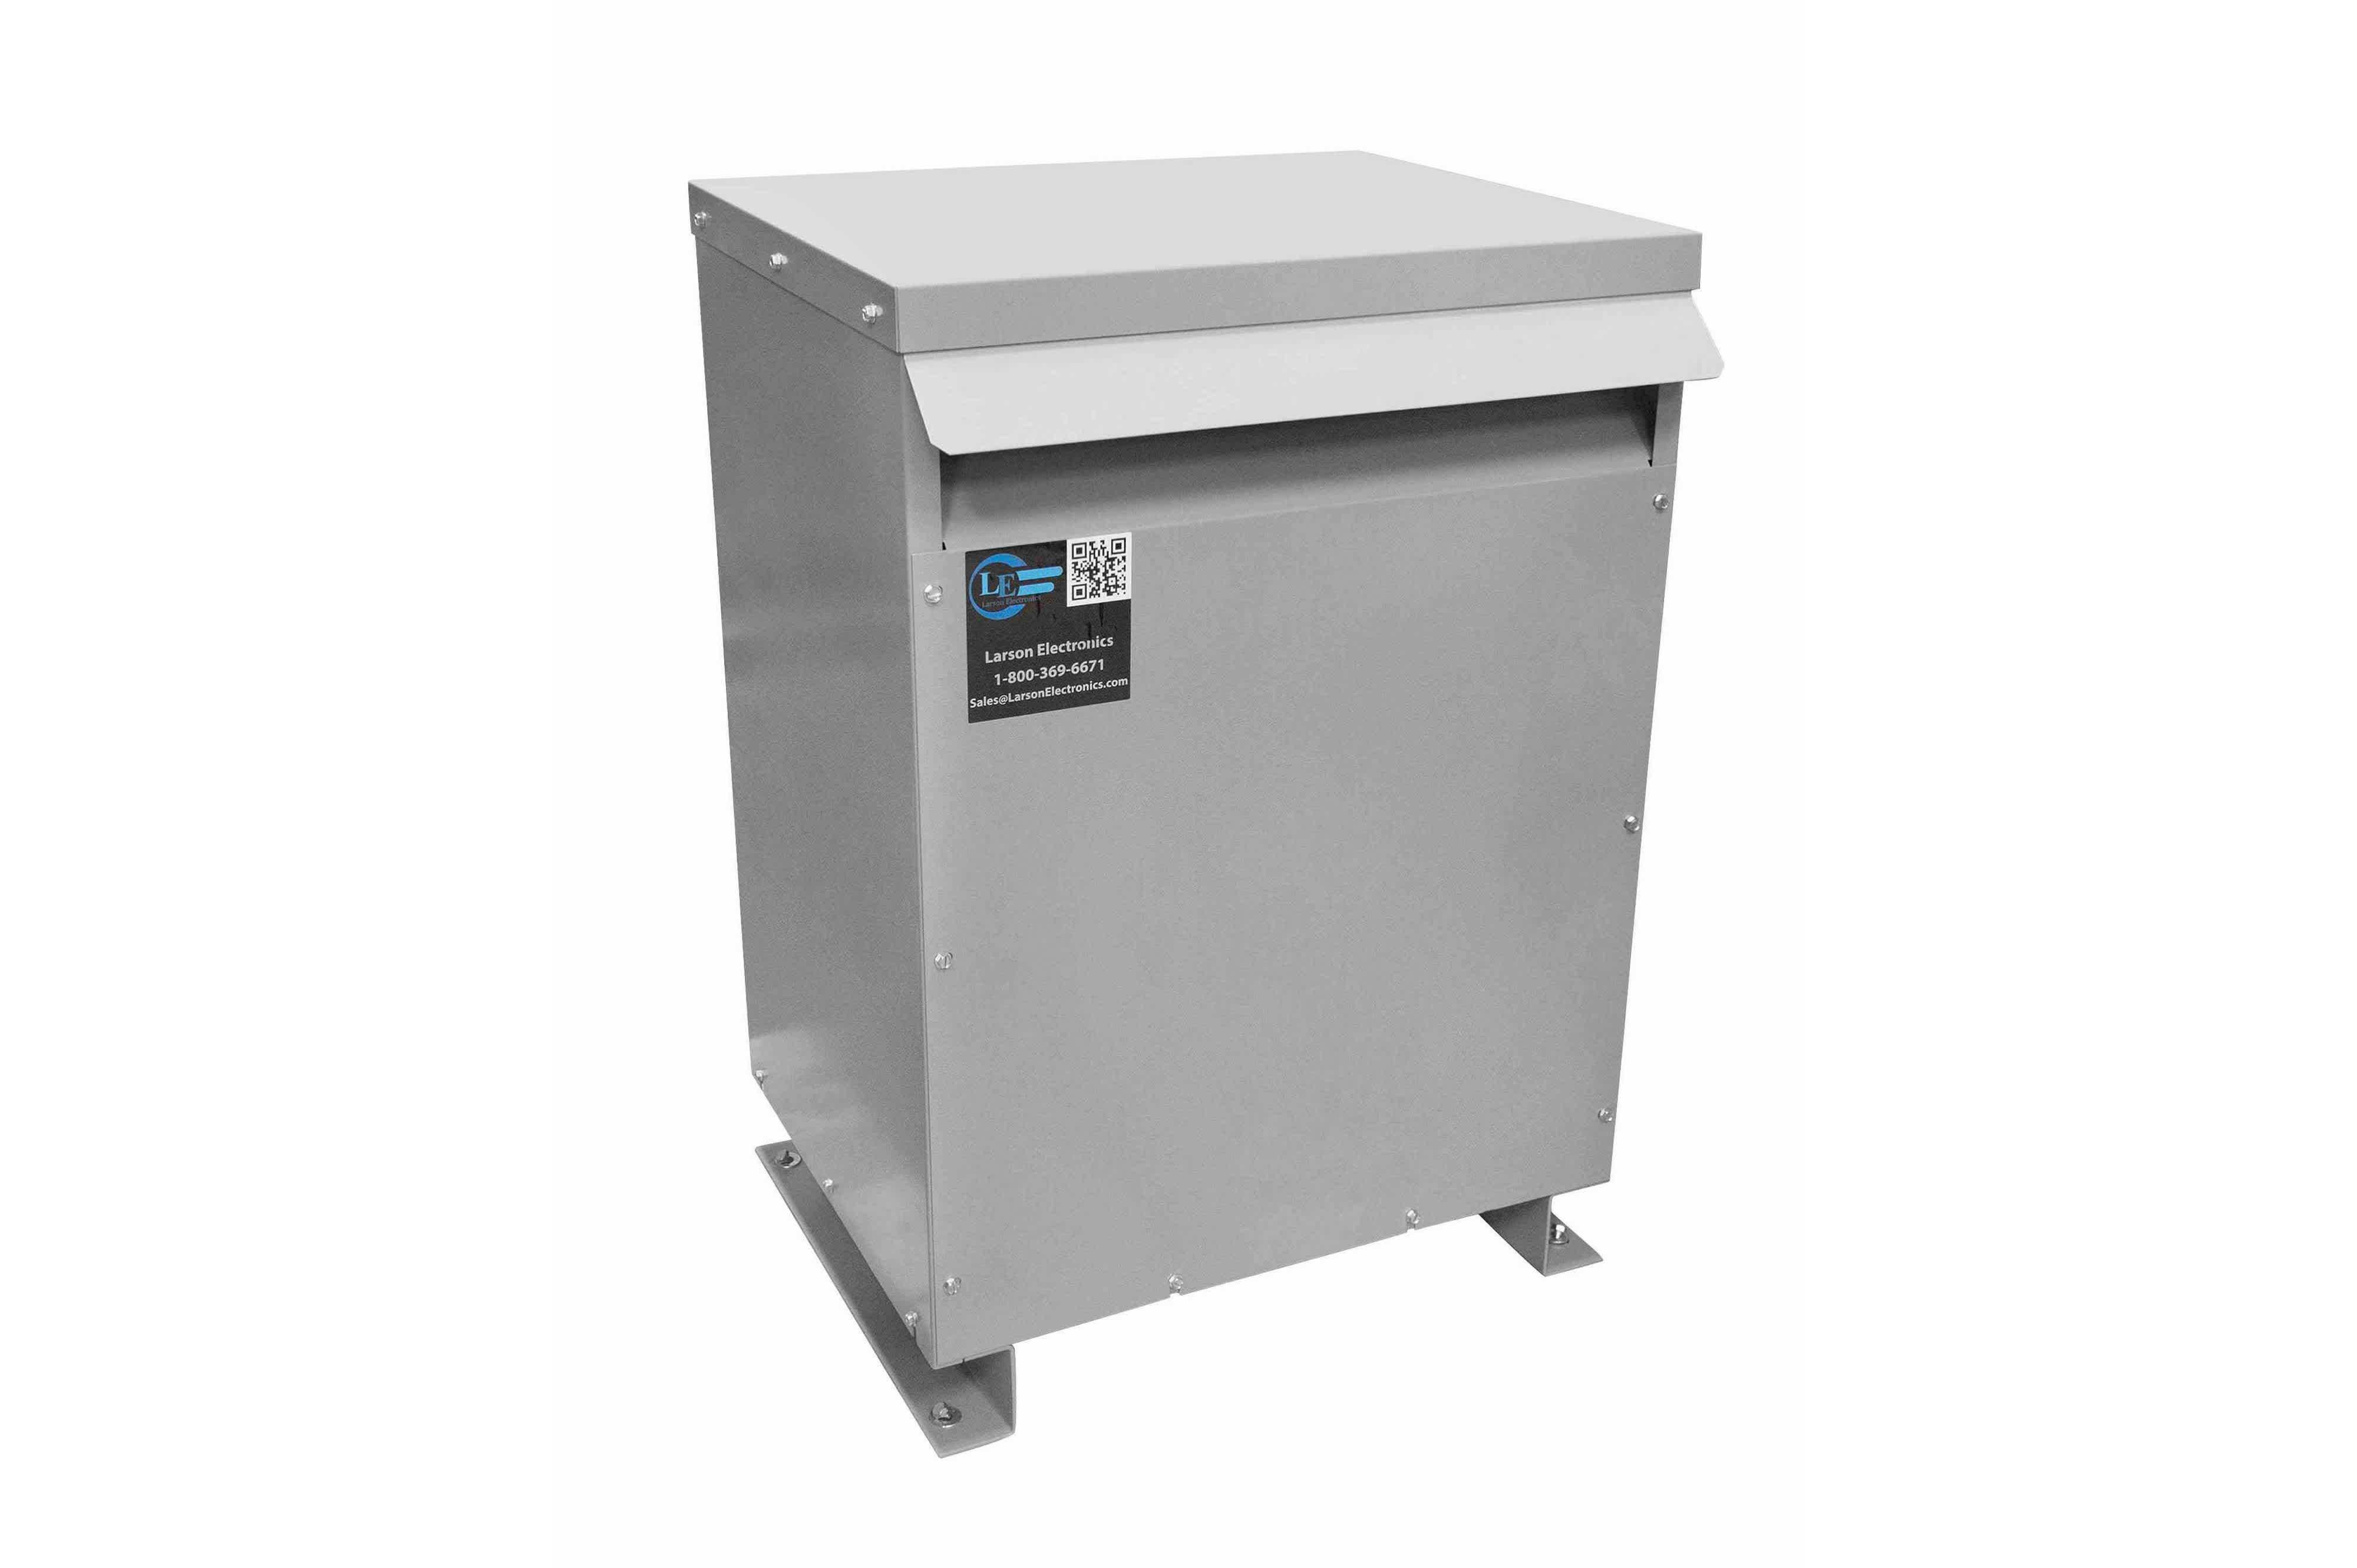 300 kVA 3PH Isolation Transformer, 380V Wye Primary, 600Y/347 Wye-N Secondary, N3R, Ventilated, 60 Hz